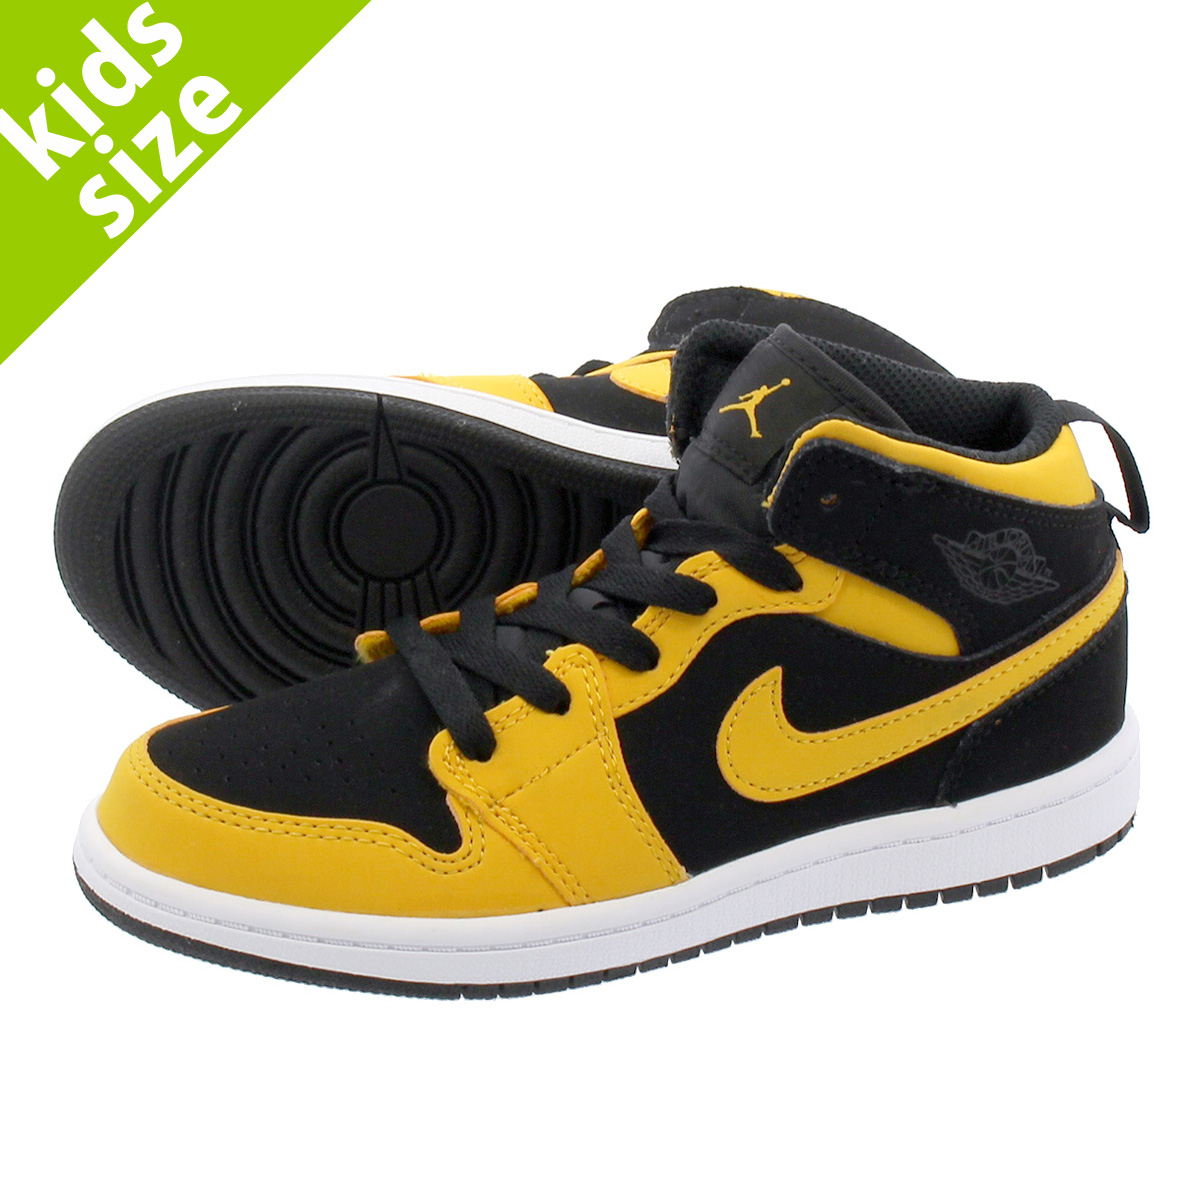 aca622a913d6 LOWTEX PLUS  NIKE AIR JORDAN 1 MID PS Nike Air Jordan 1 mid PS BLACK ...